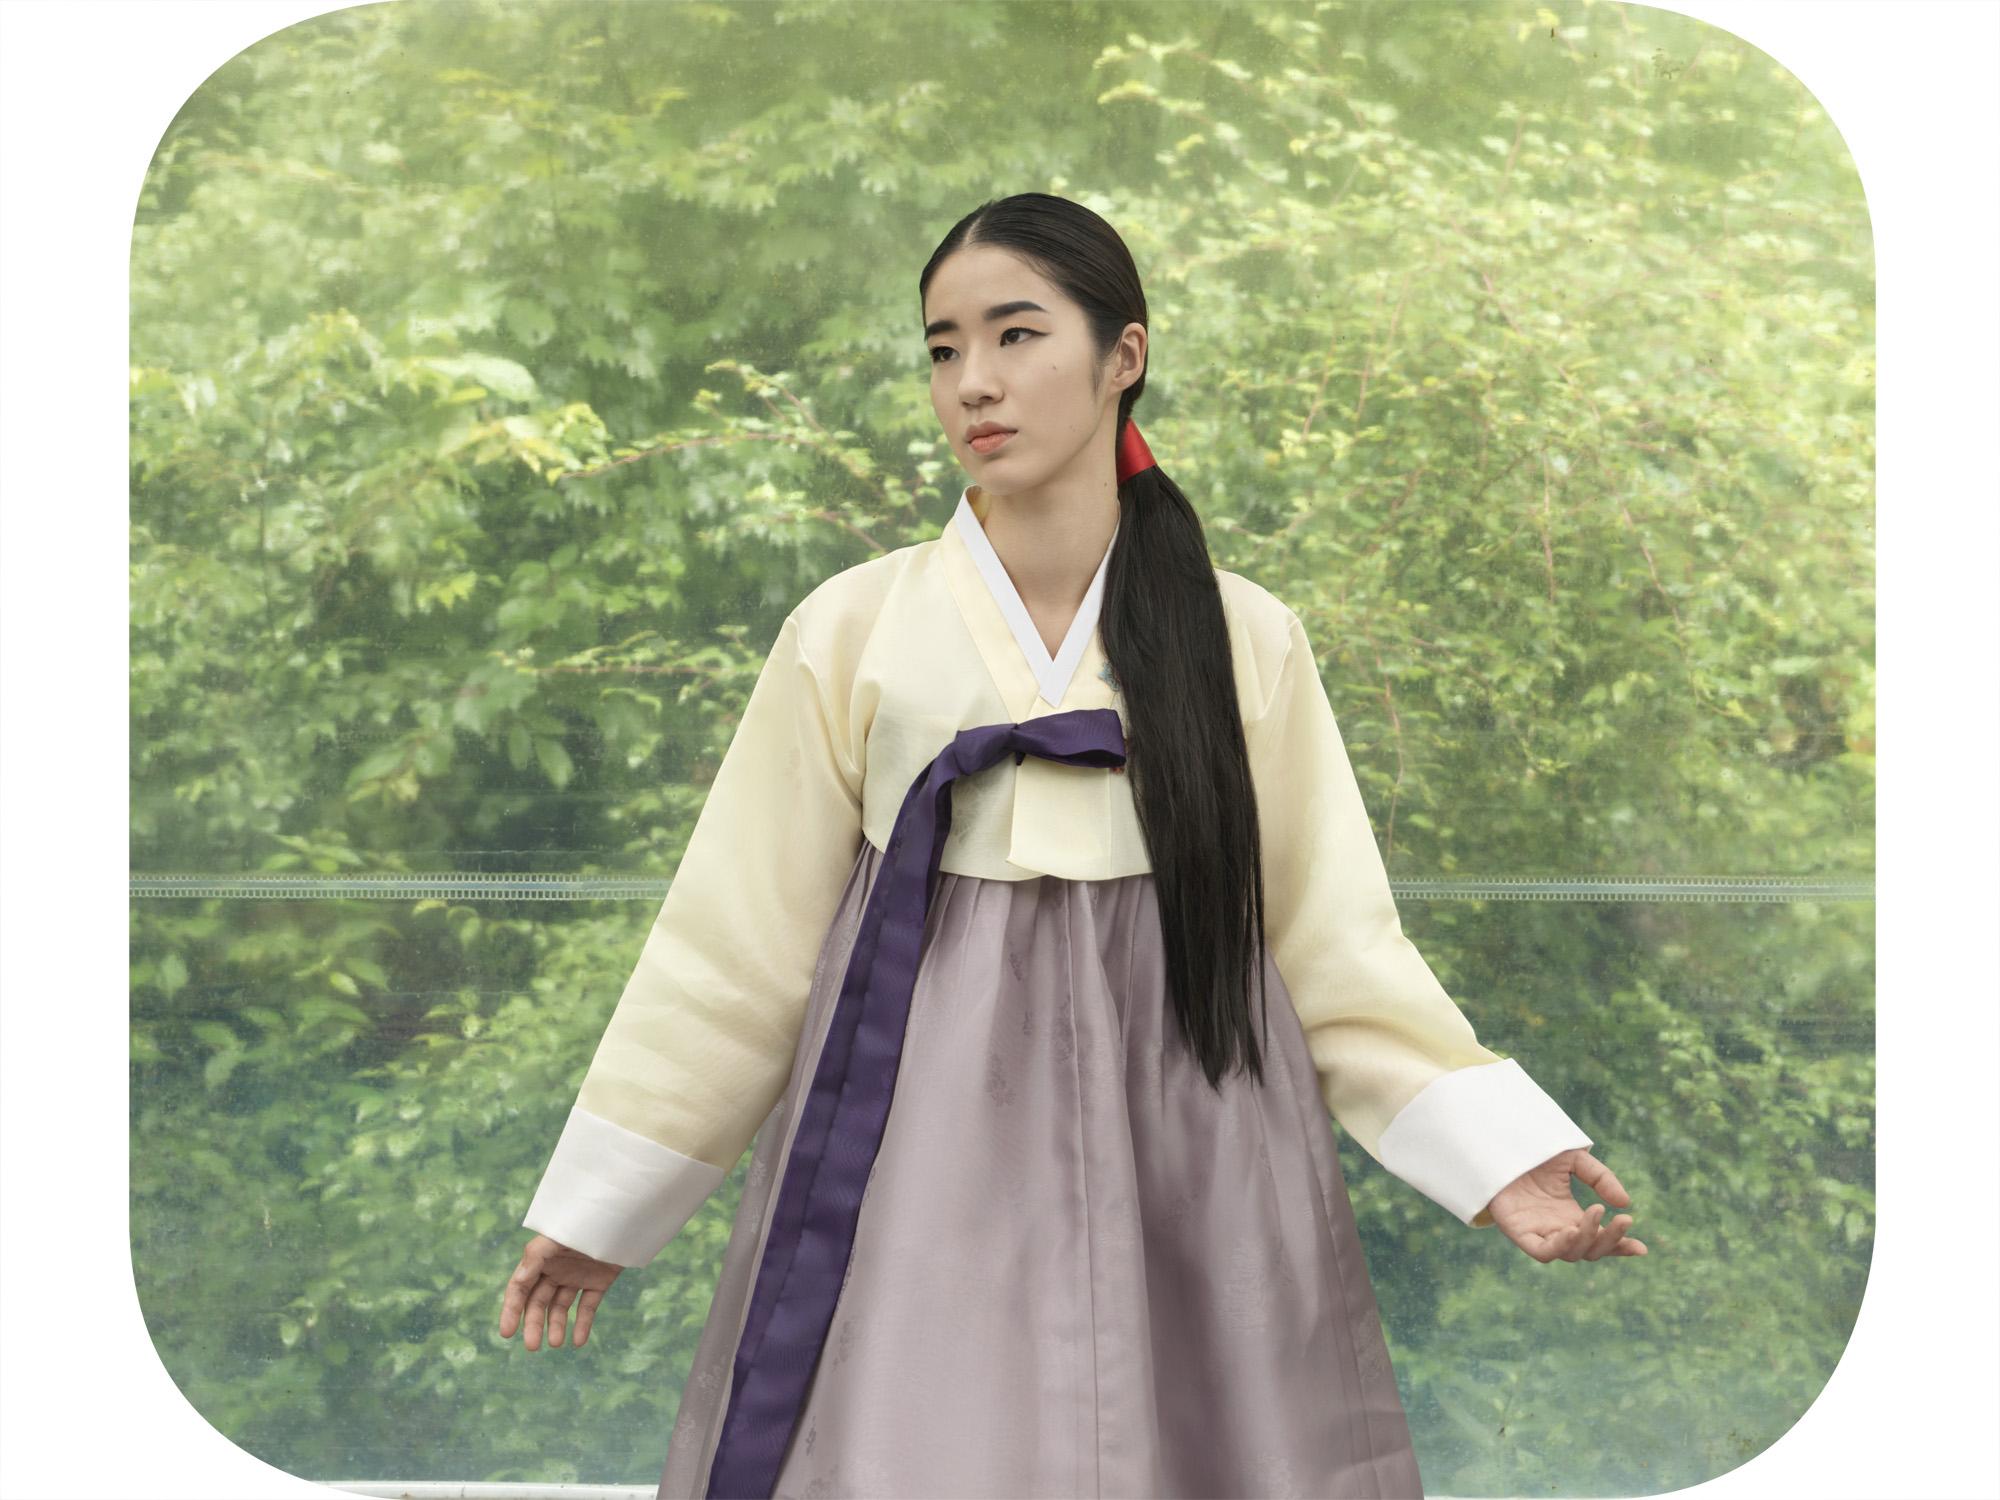 Korea_Soohee Oh